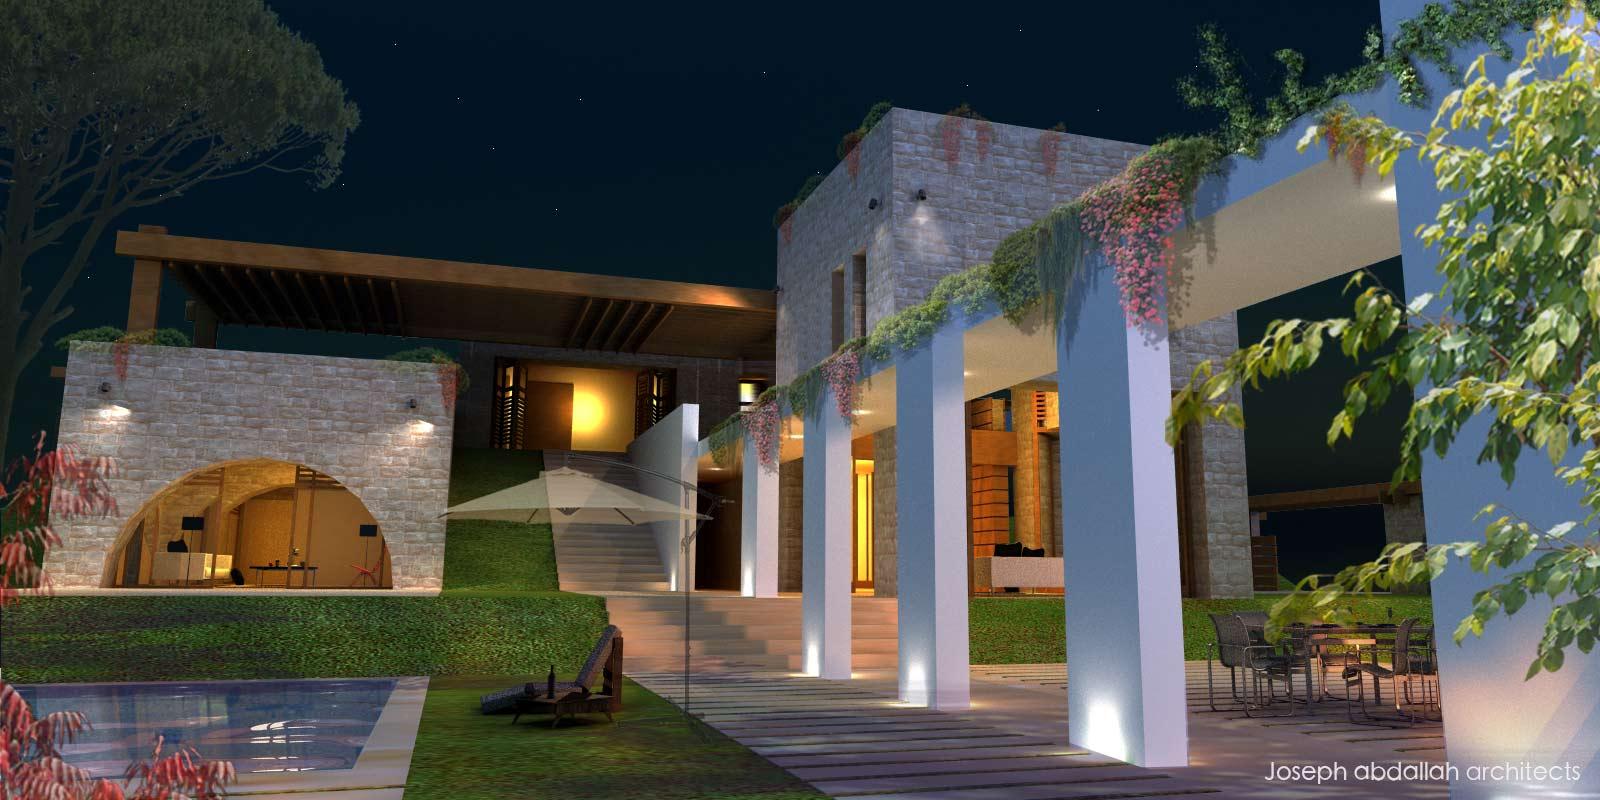 community-ajaltoun-villa-architecture-landscape-bnache-lebanon-joseph-abdallah-architects-4